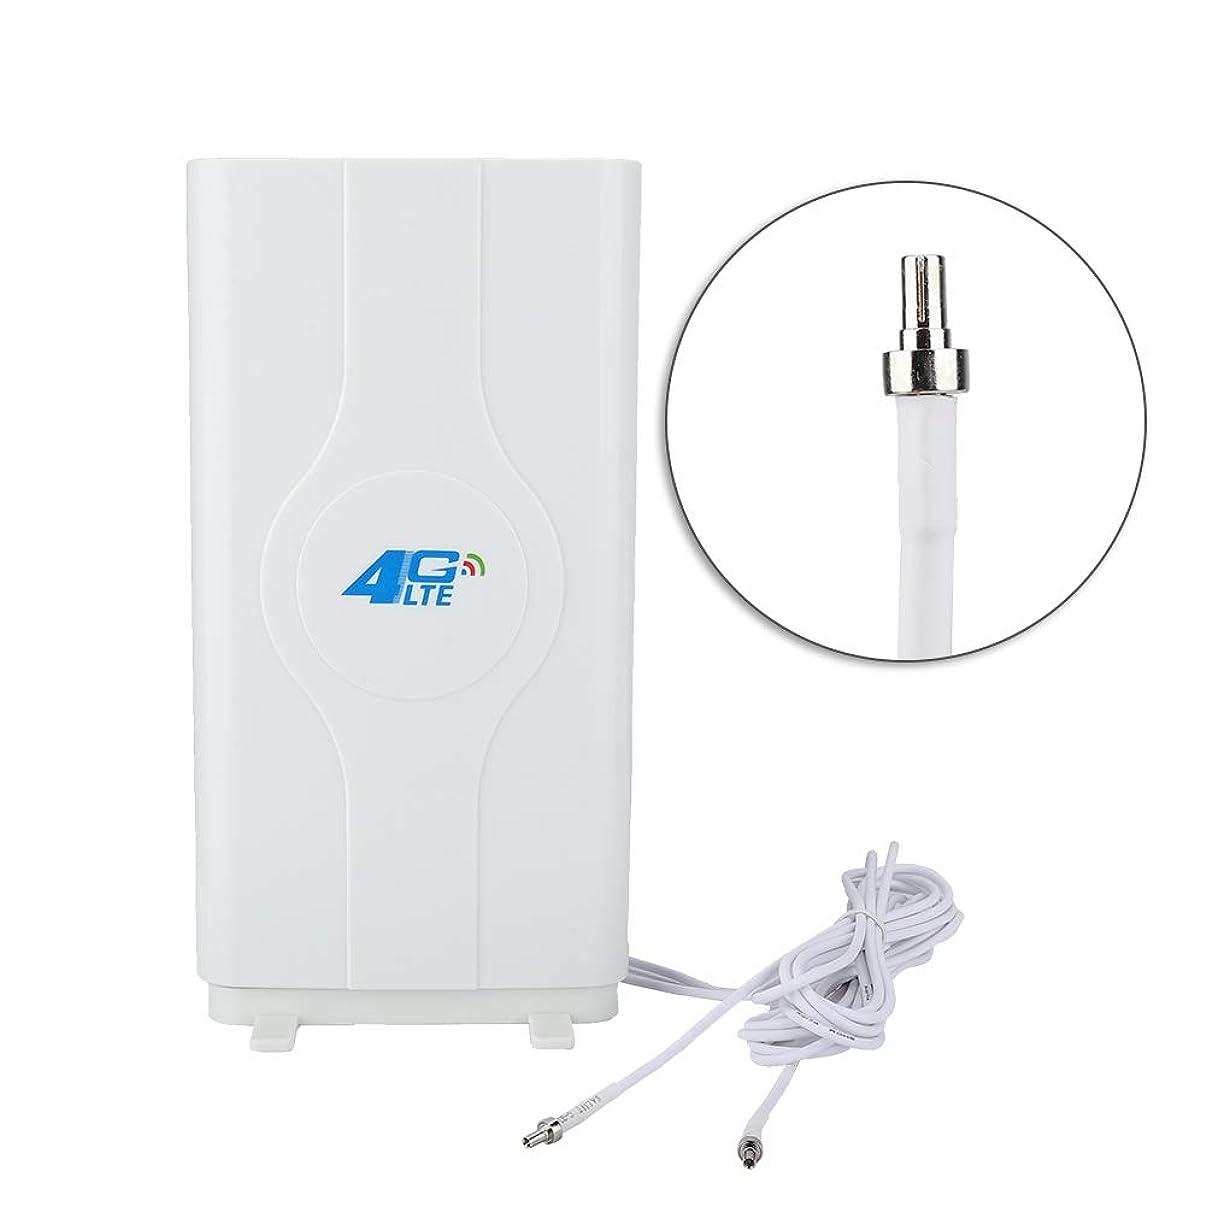 ASHATA 4G LTE Antenna, 4G High Power LTE Antenna 88dBi High Gain Network Ethernet Amplifier Antenna,TS9/ SMA/ CRC9 4G LTE Directional Signal Amplifier Antenna White(CRC9)